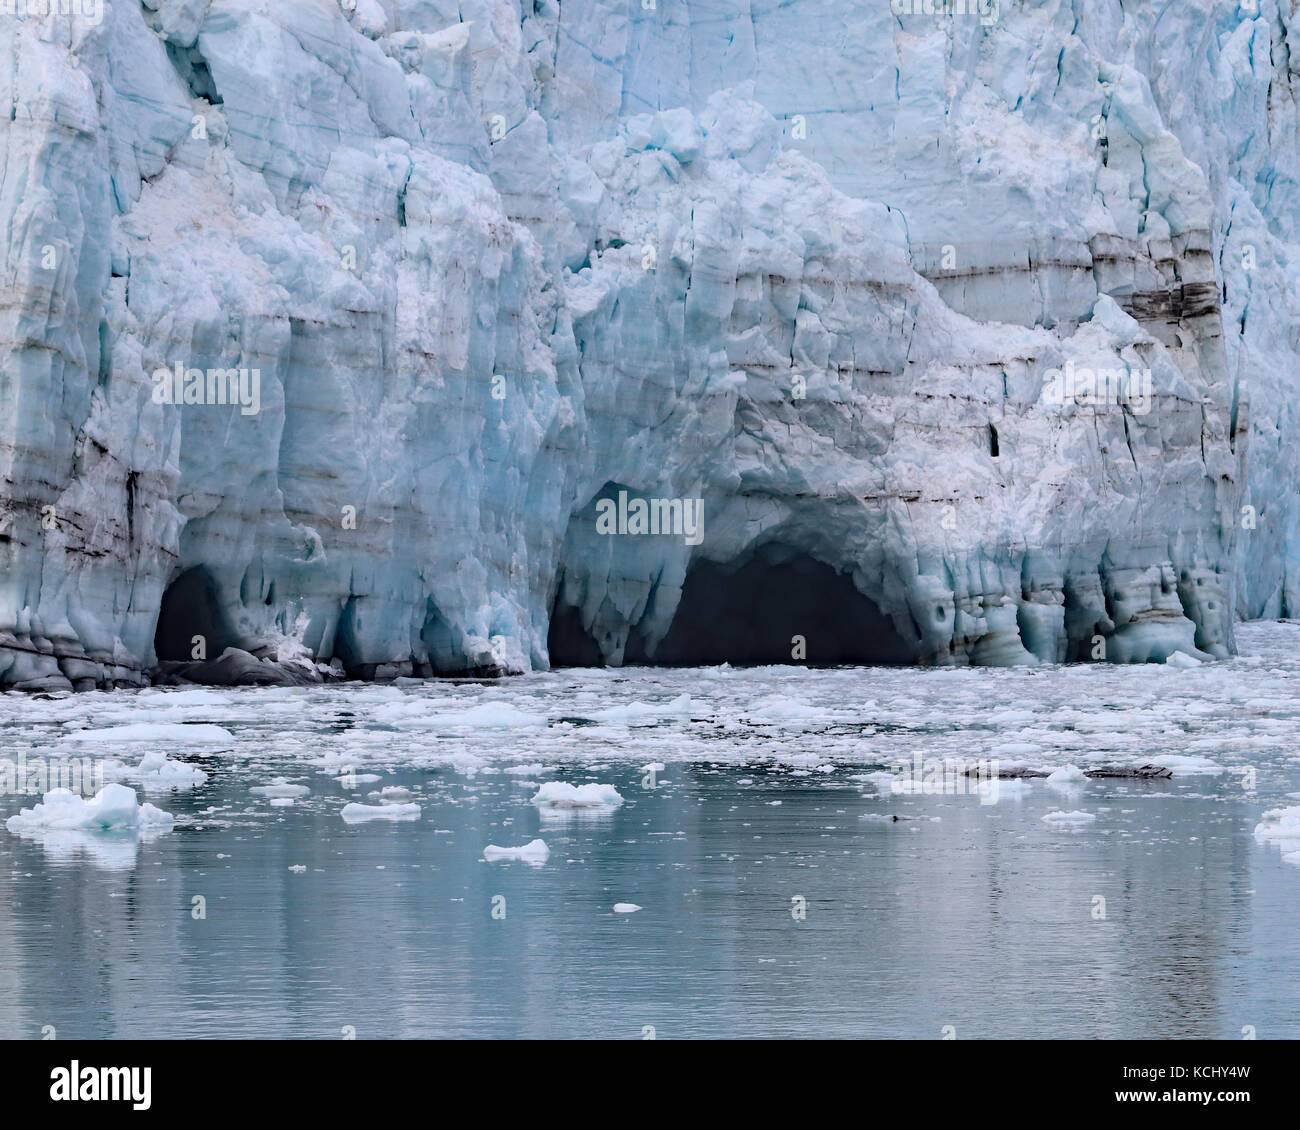 Melting ice leaves caves behind on Margerie glacier in Glacier Bay National Park and Preserve, Alaska - Stock Image